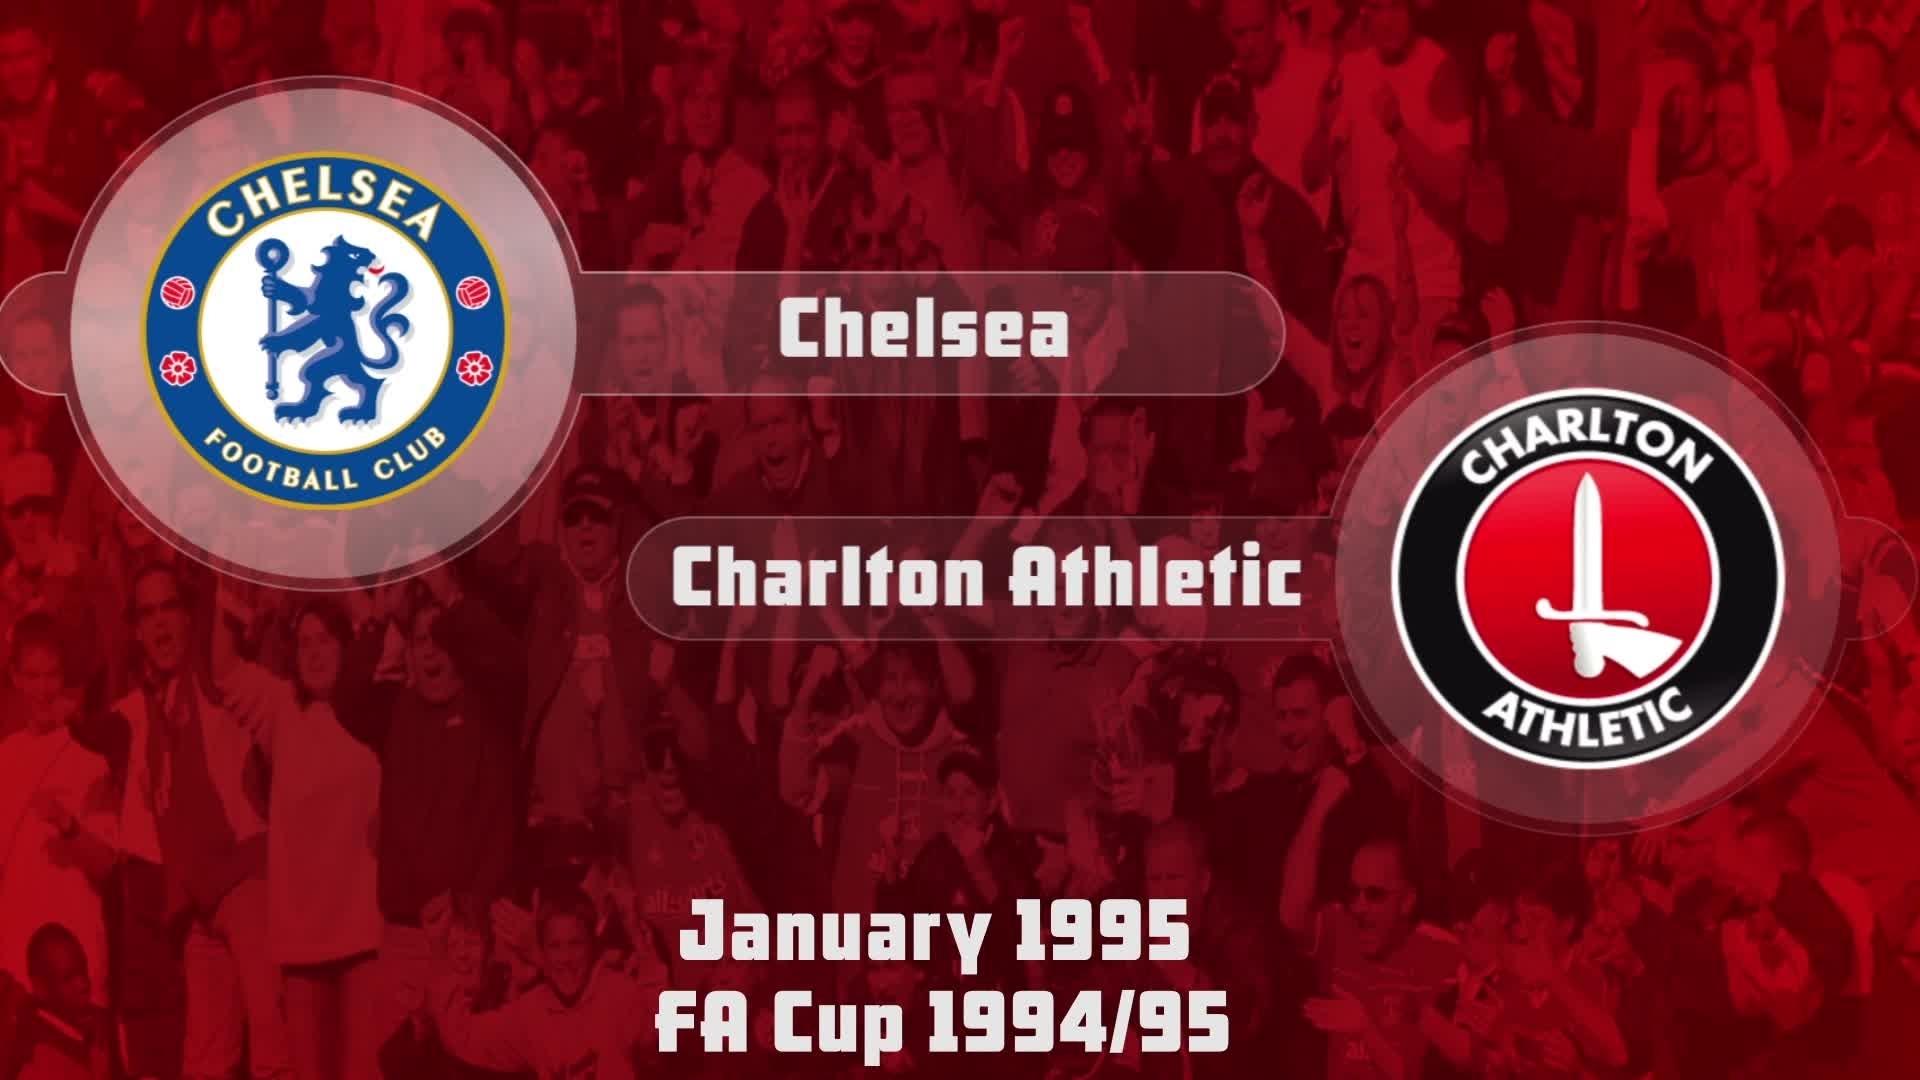 28 HIGHLIGHTS | Chelsea 3 Charlton 0 (FA Cup Jan 1995)